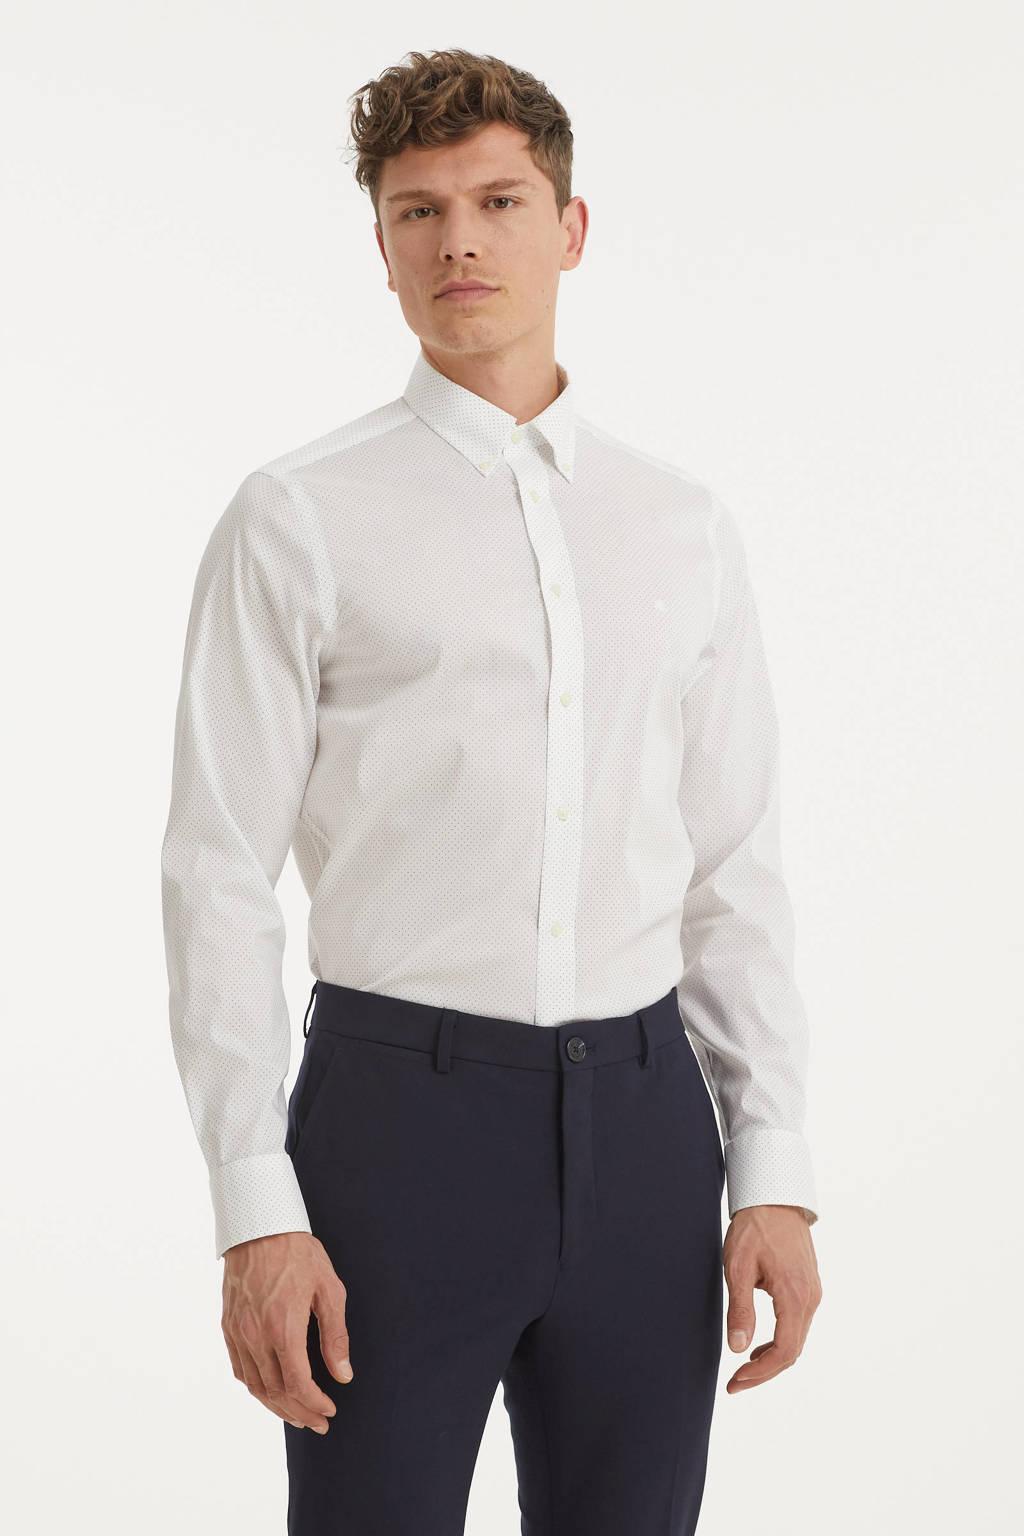 POLO Ralph Lauren slim fit overhemd met stippen wit/donkerblauw, Wit/donkerblauw